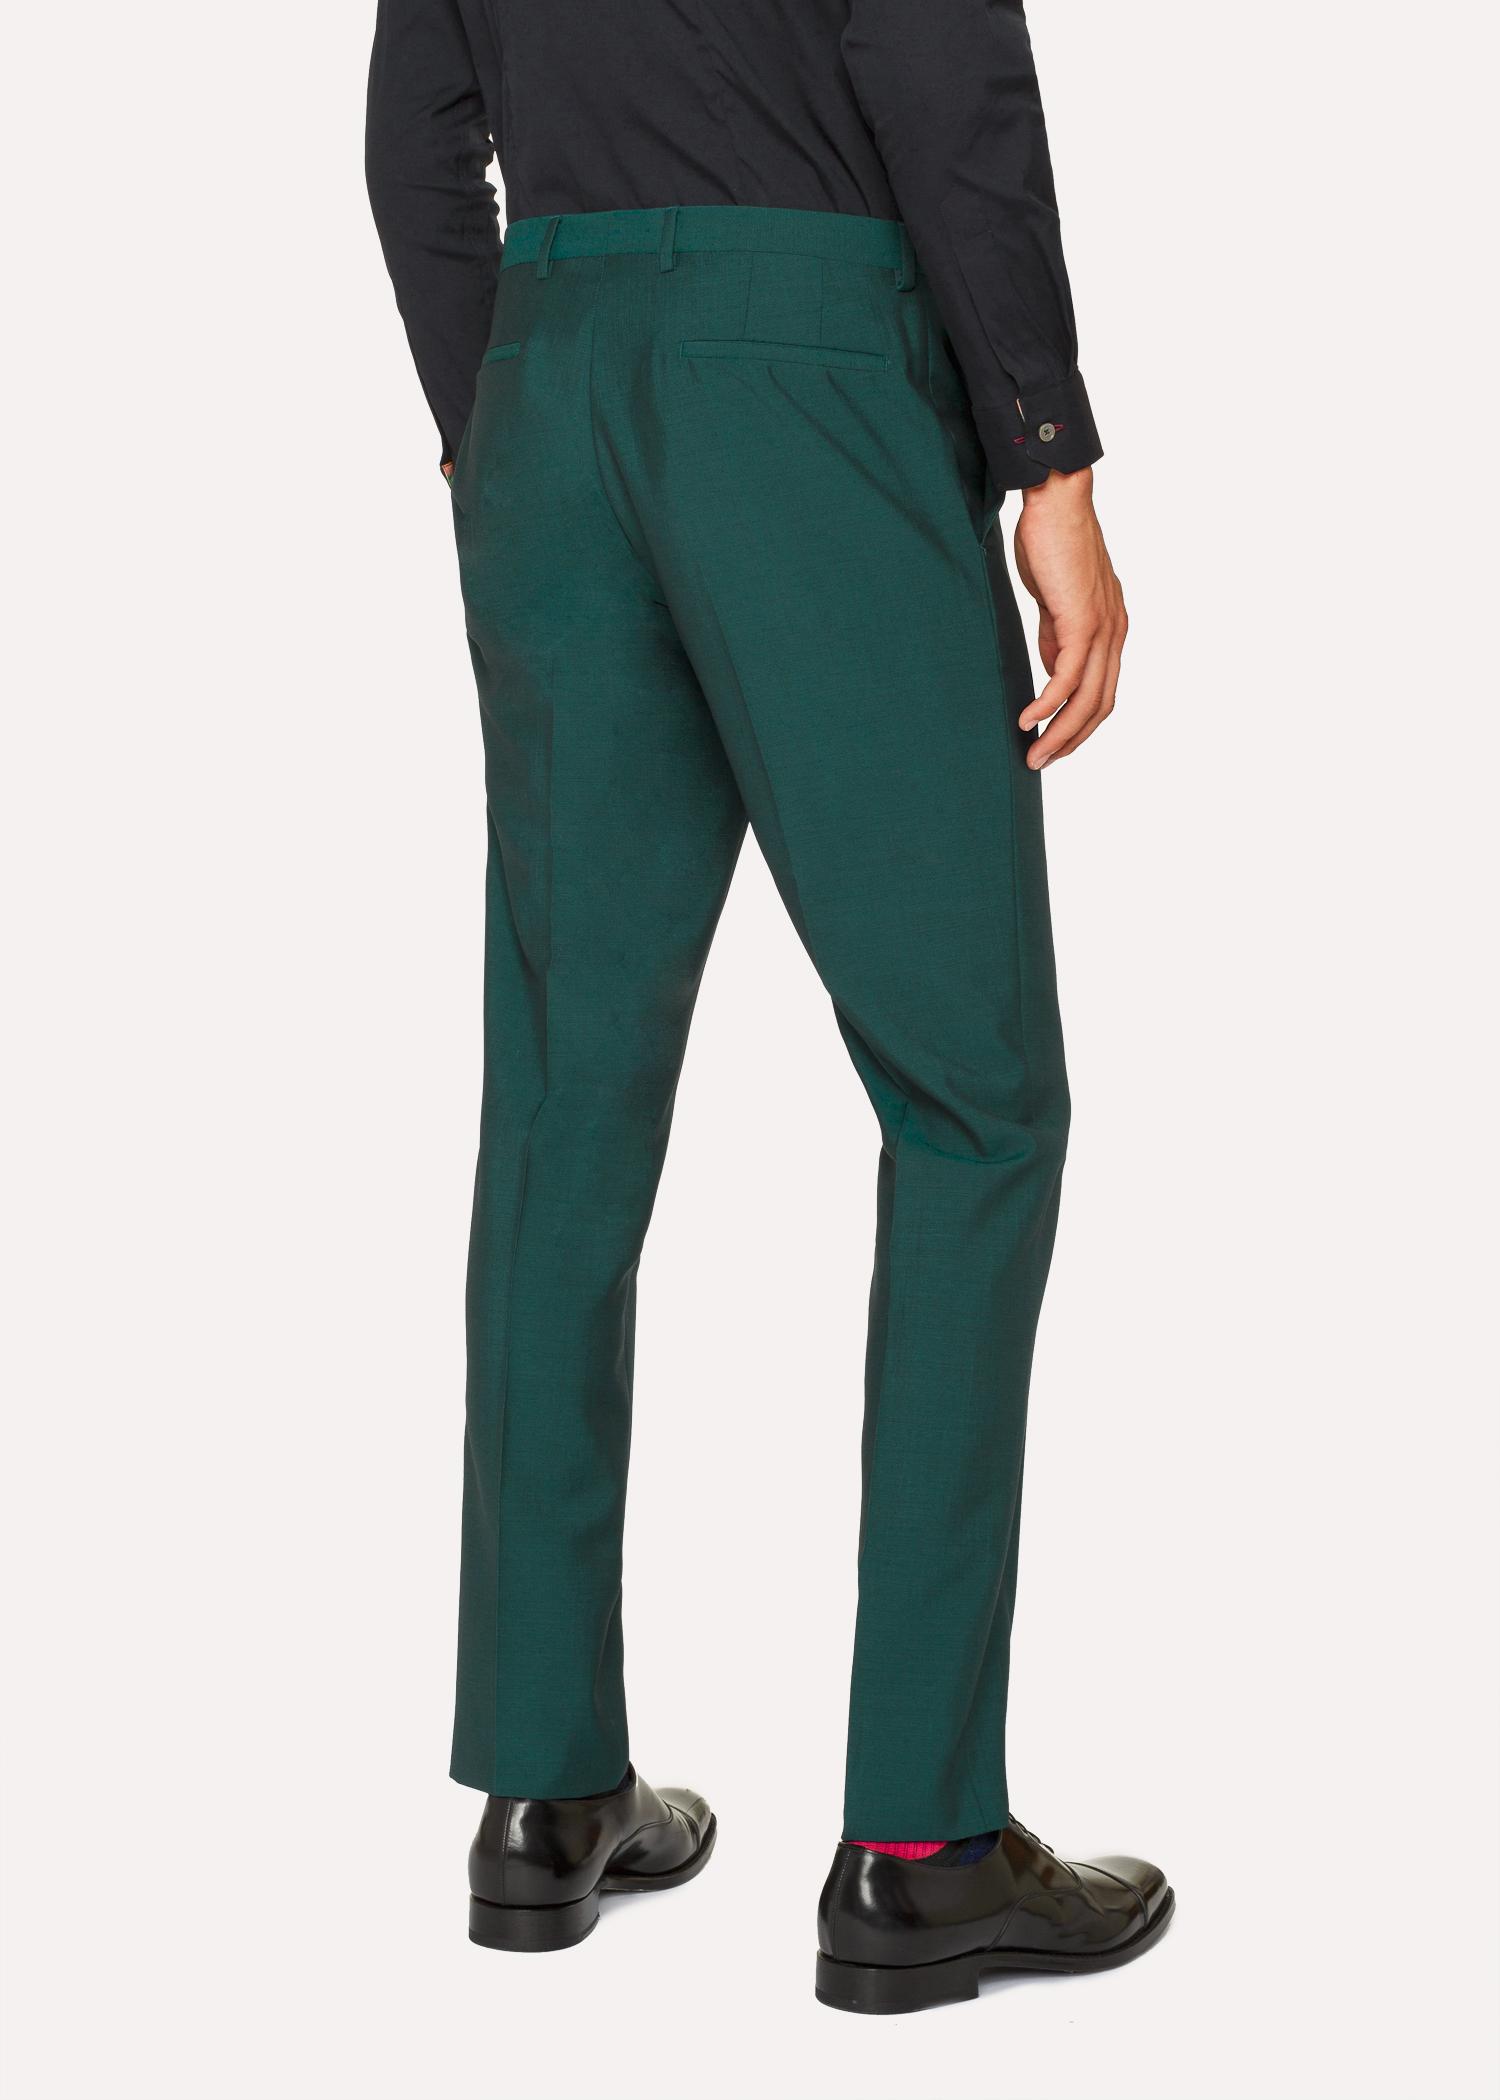 costume homme vert fonc en laine et mohair coupe slim. Black Bedroom Furniture Sets. Home Design Ideas